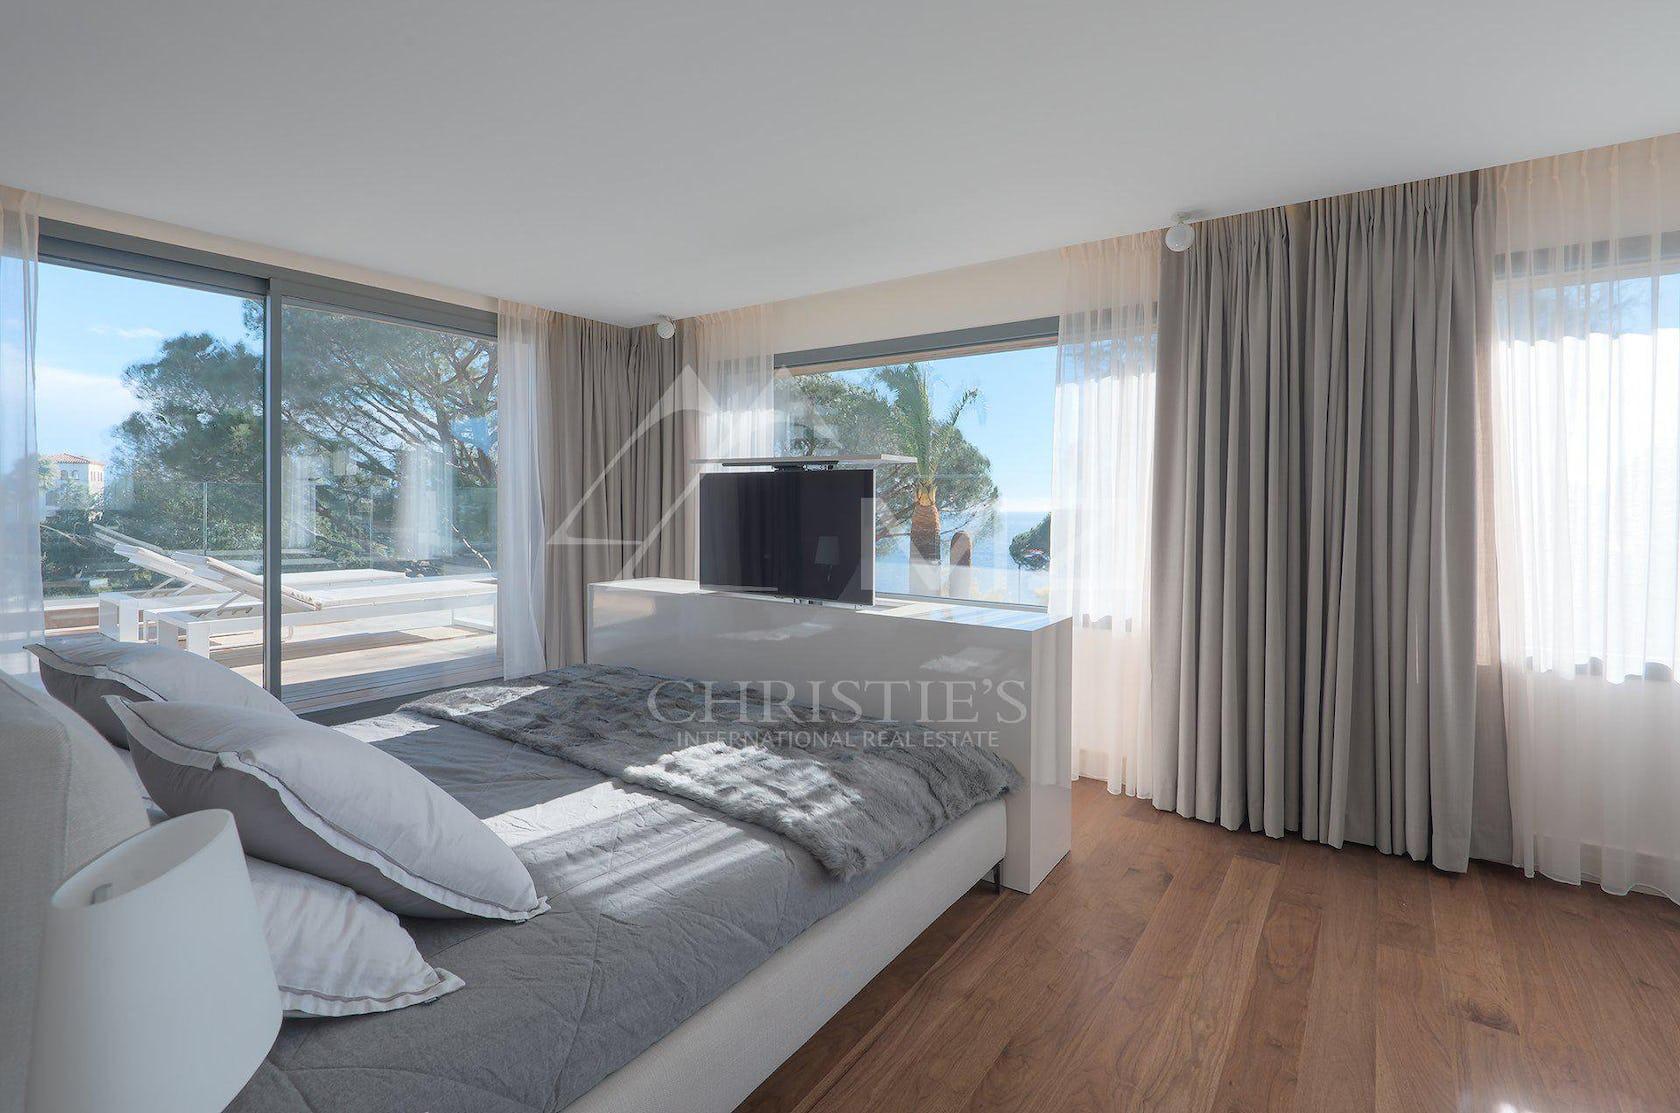 interior design indoors flooring furniture bedroom room home decor bed wood cushion